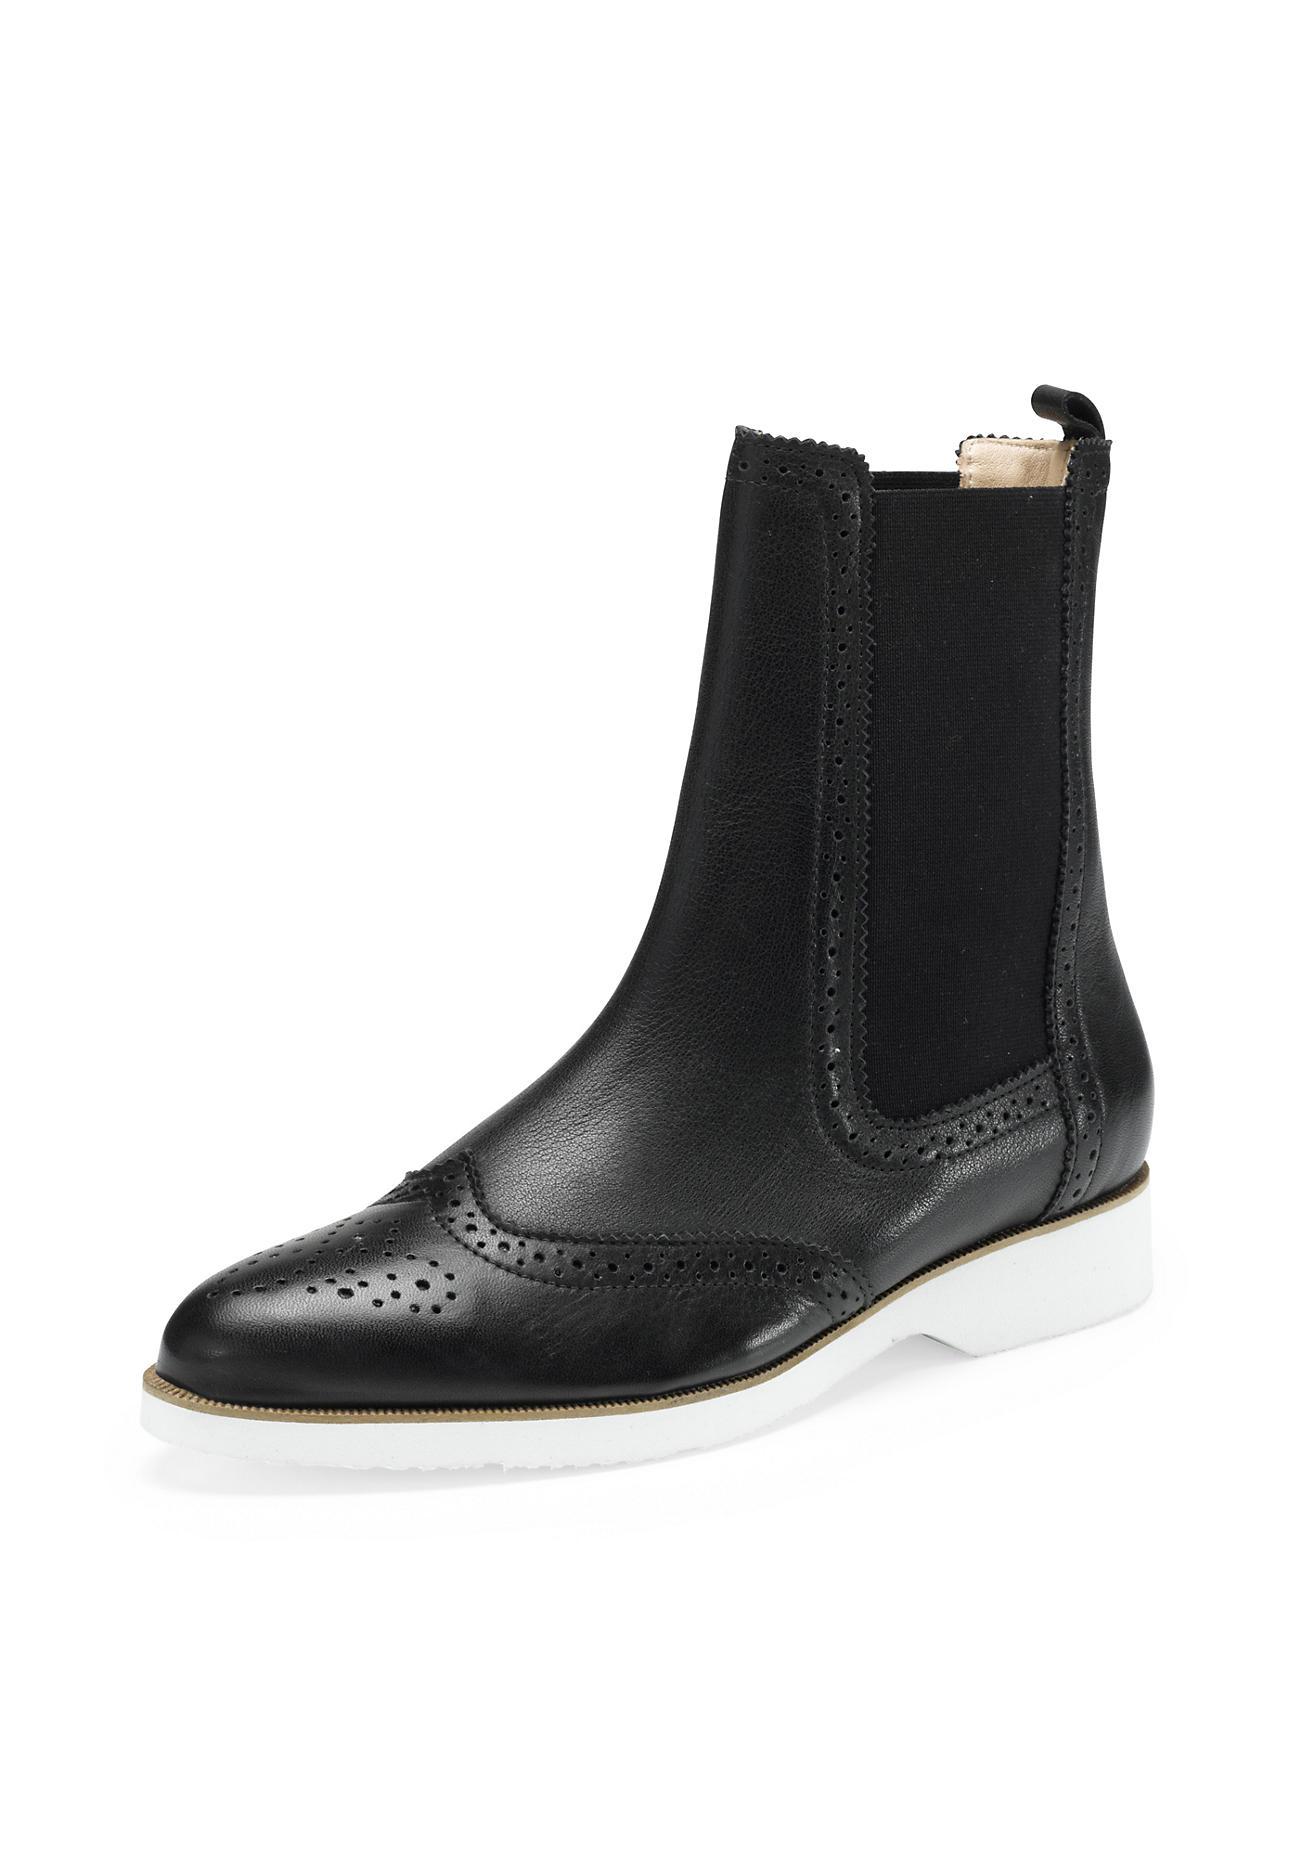 hessnatur Damen Damen Chelsea Boots aus Leder – schwarz – Größe 38